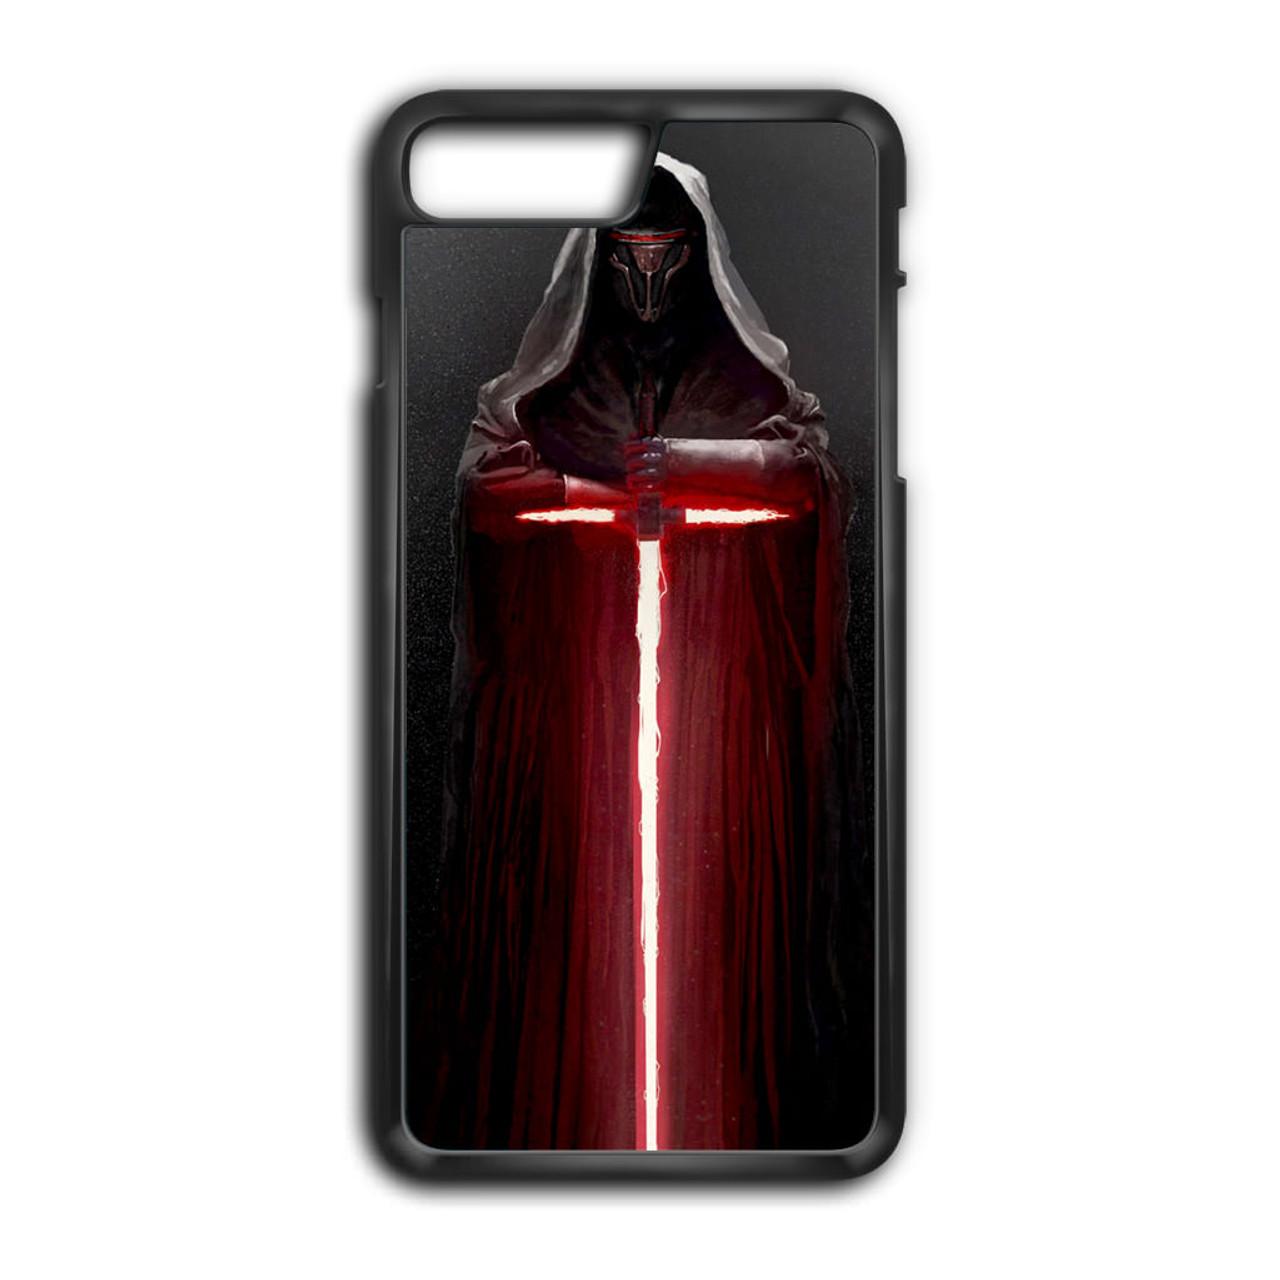 pretty nice 090eb 0a945 Kylo Ren Lightsaber Star Wars iPhone 7 Plus Case - CASESHUNTER